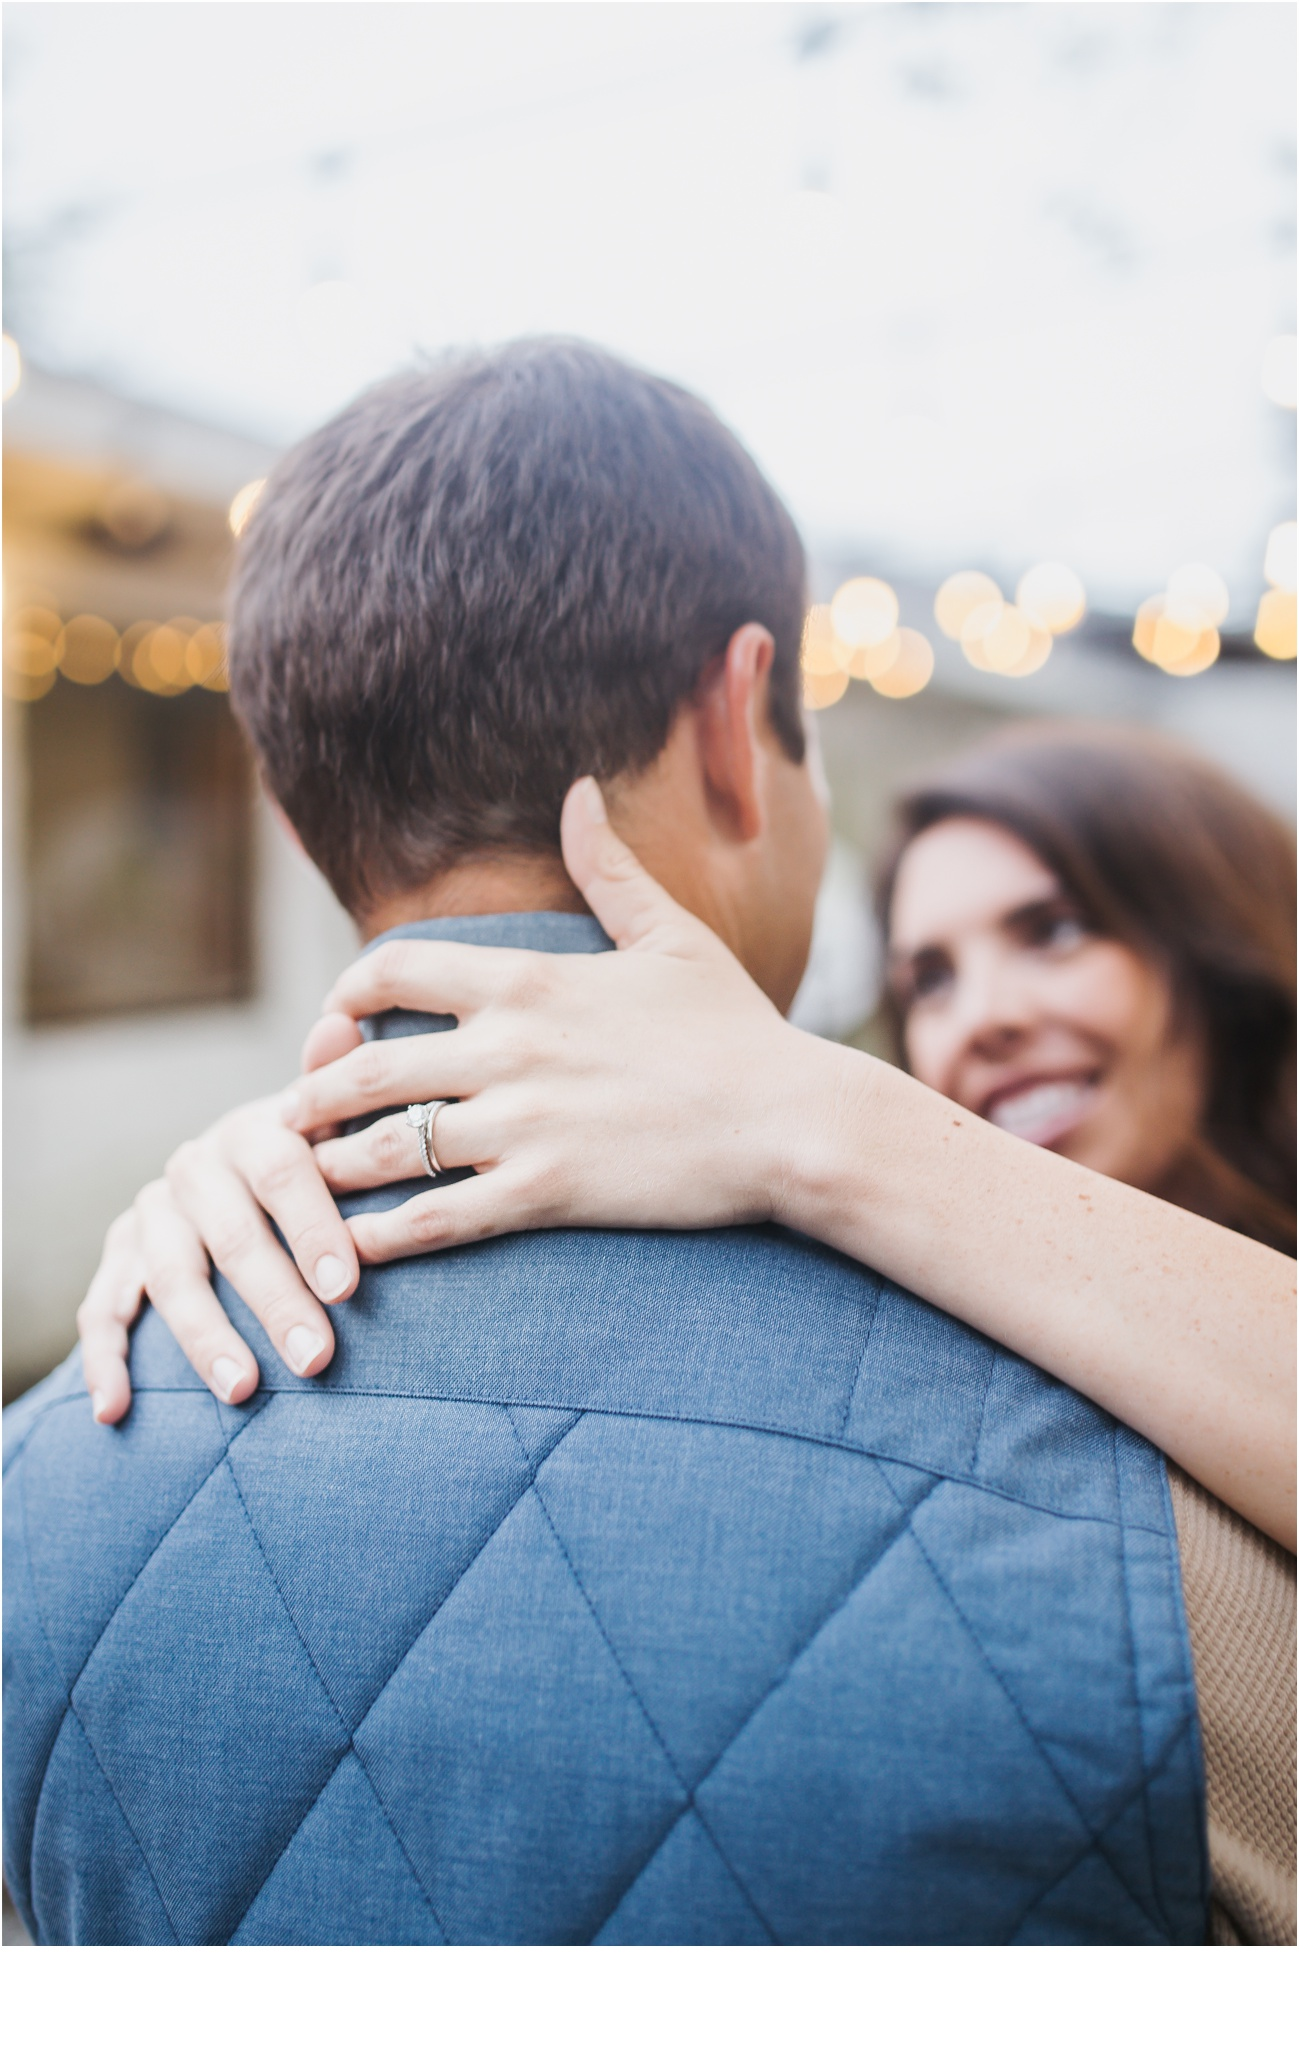 Rainey_Gregg_Photography_St._Simons_Island_Georgia_California_Wedding_Portrait_Photography_1206.jpg